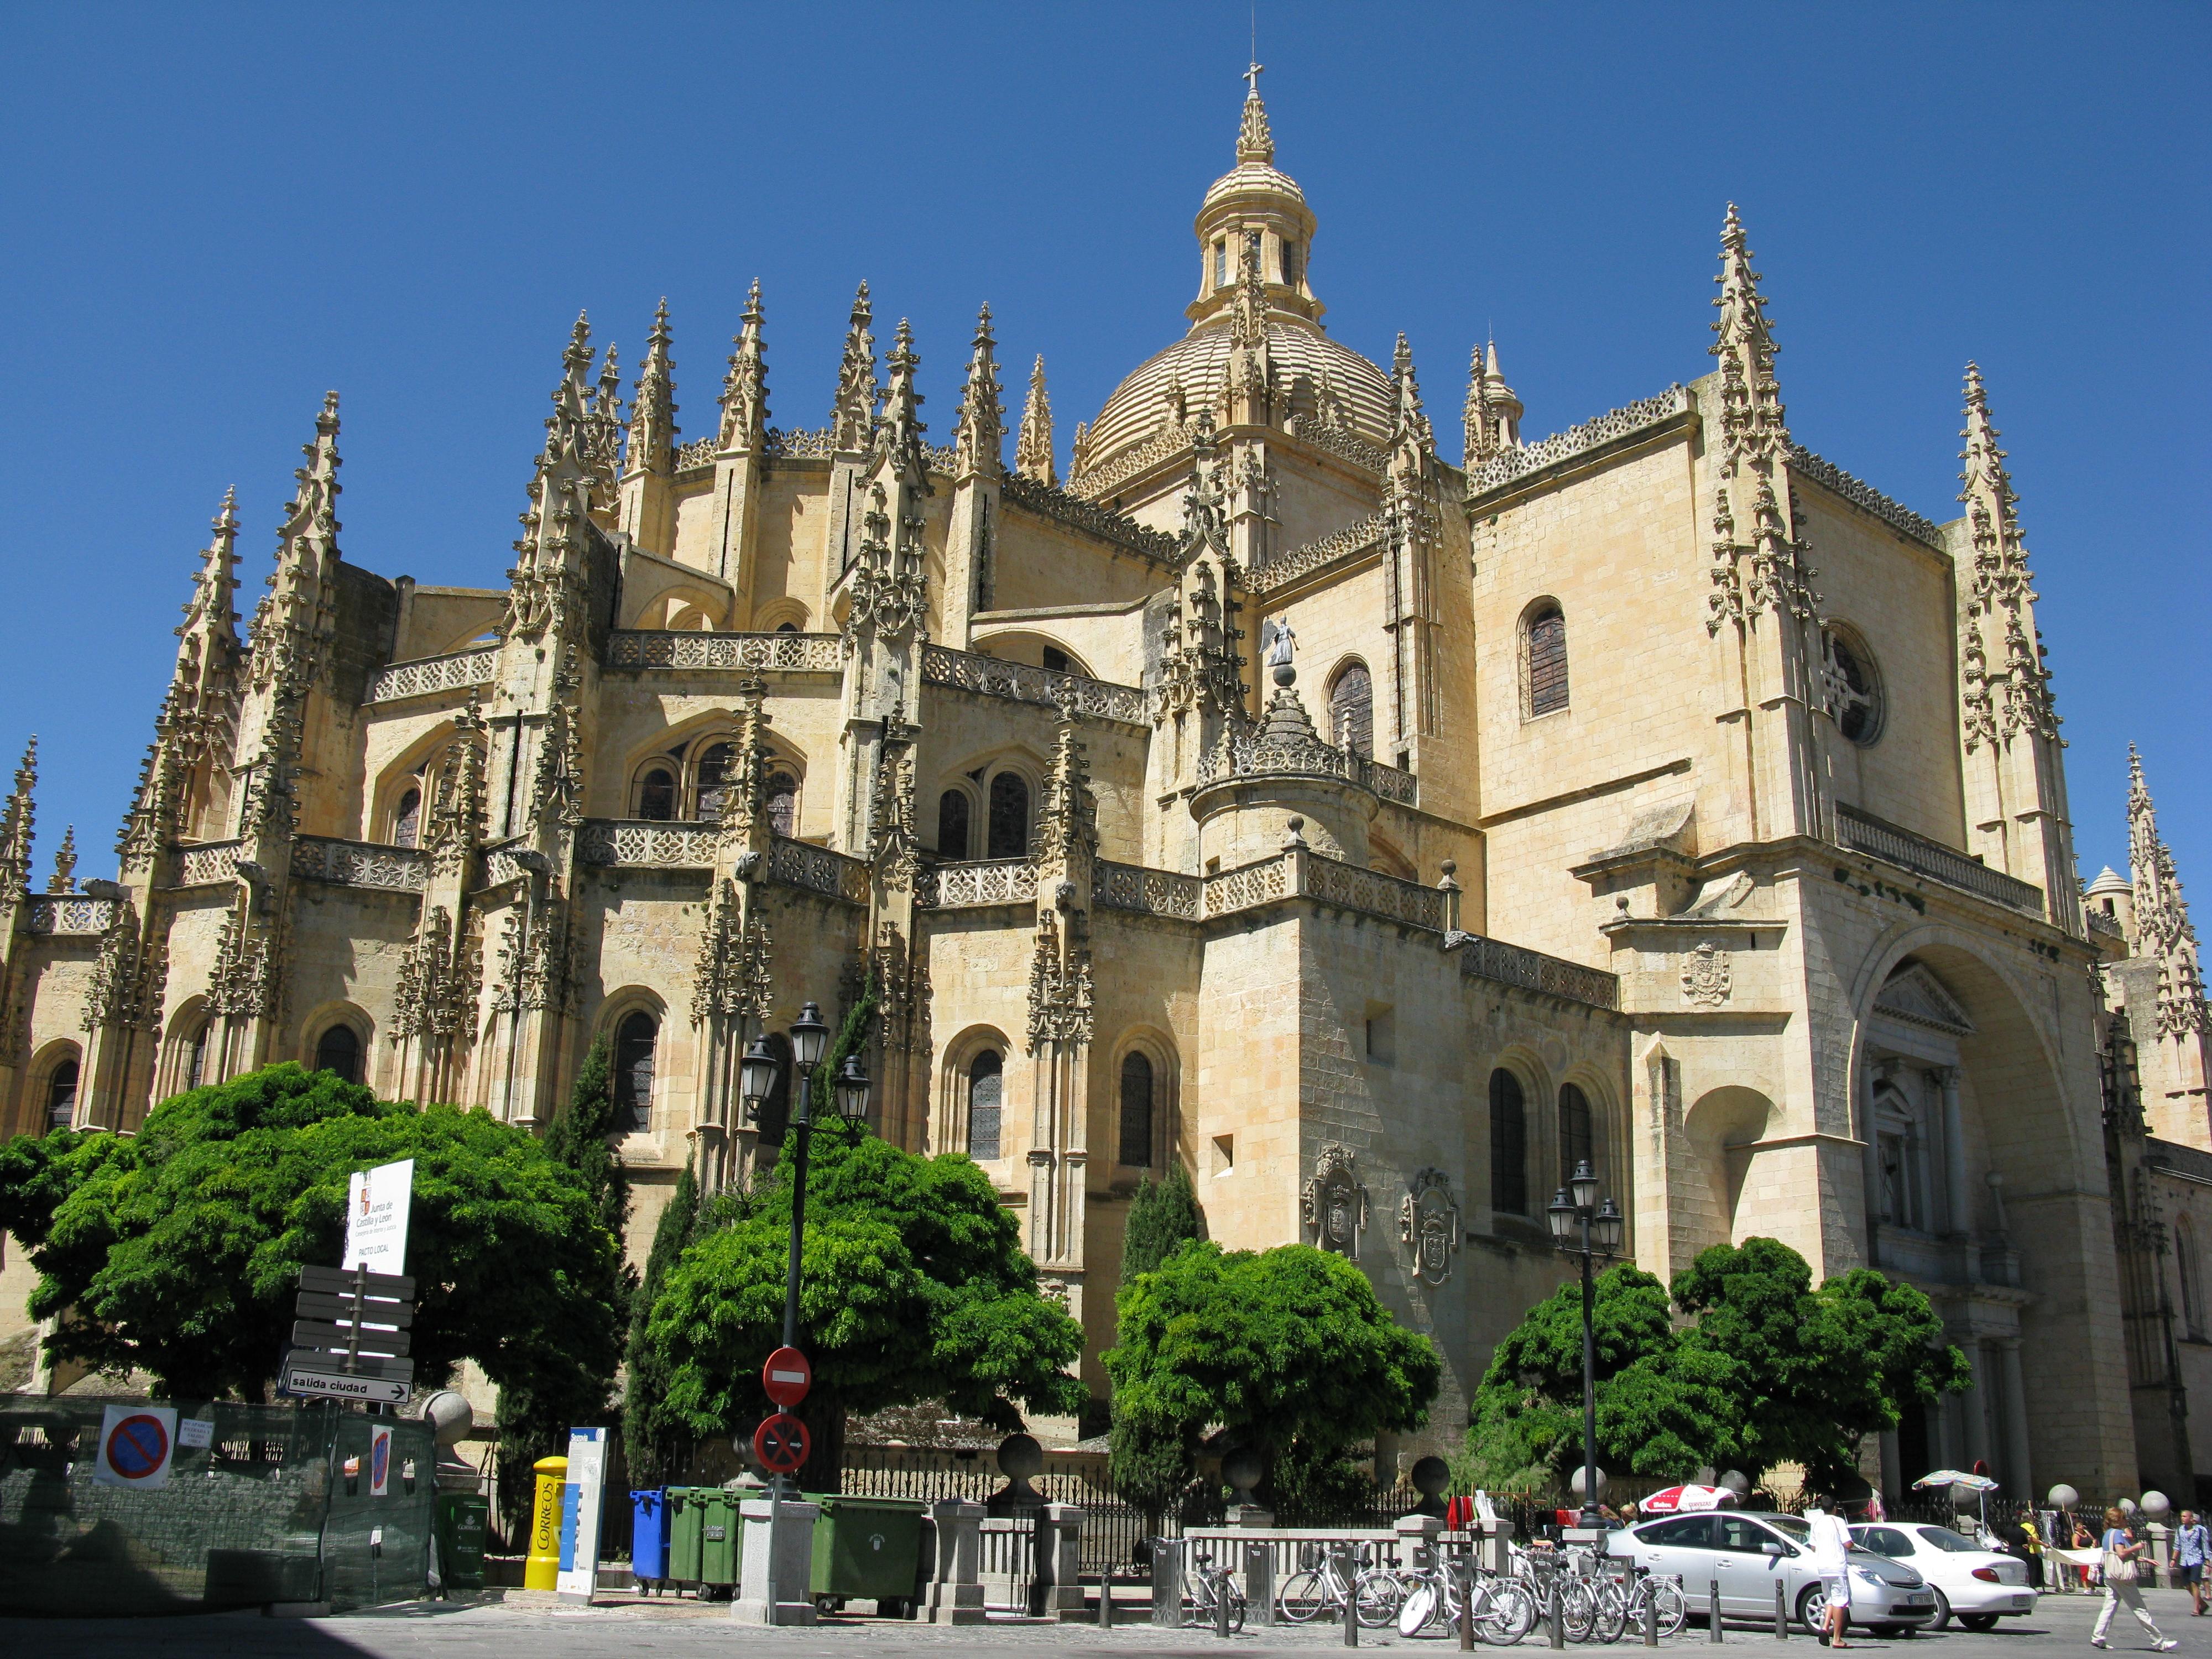 File:Catedral Segovia 2010.jpg - Wikimedia Commons